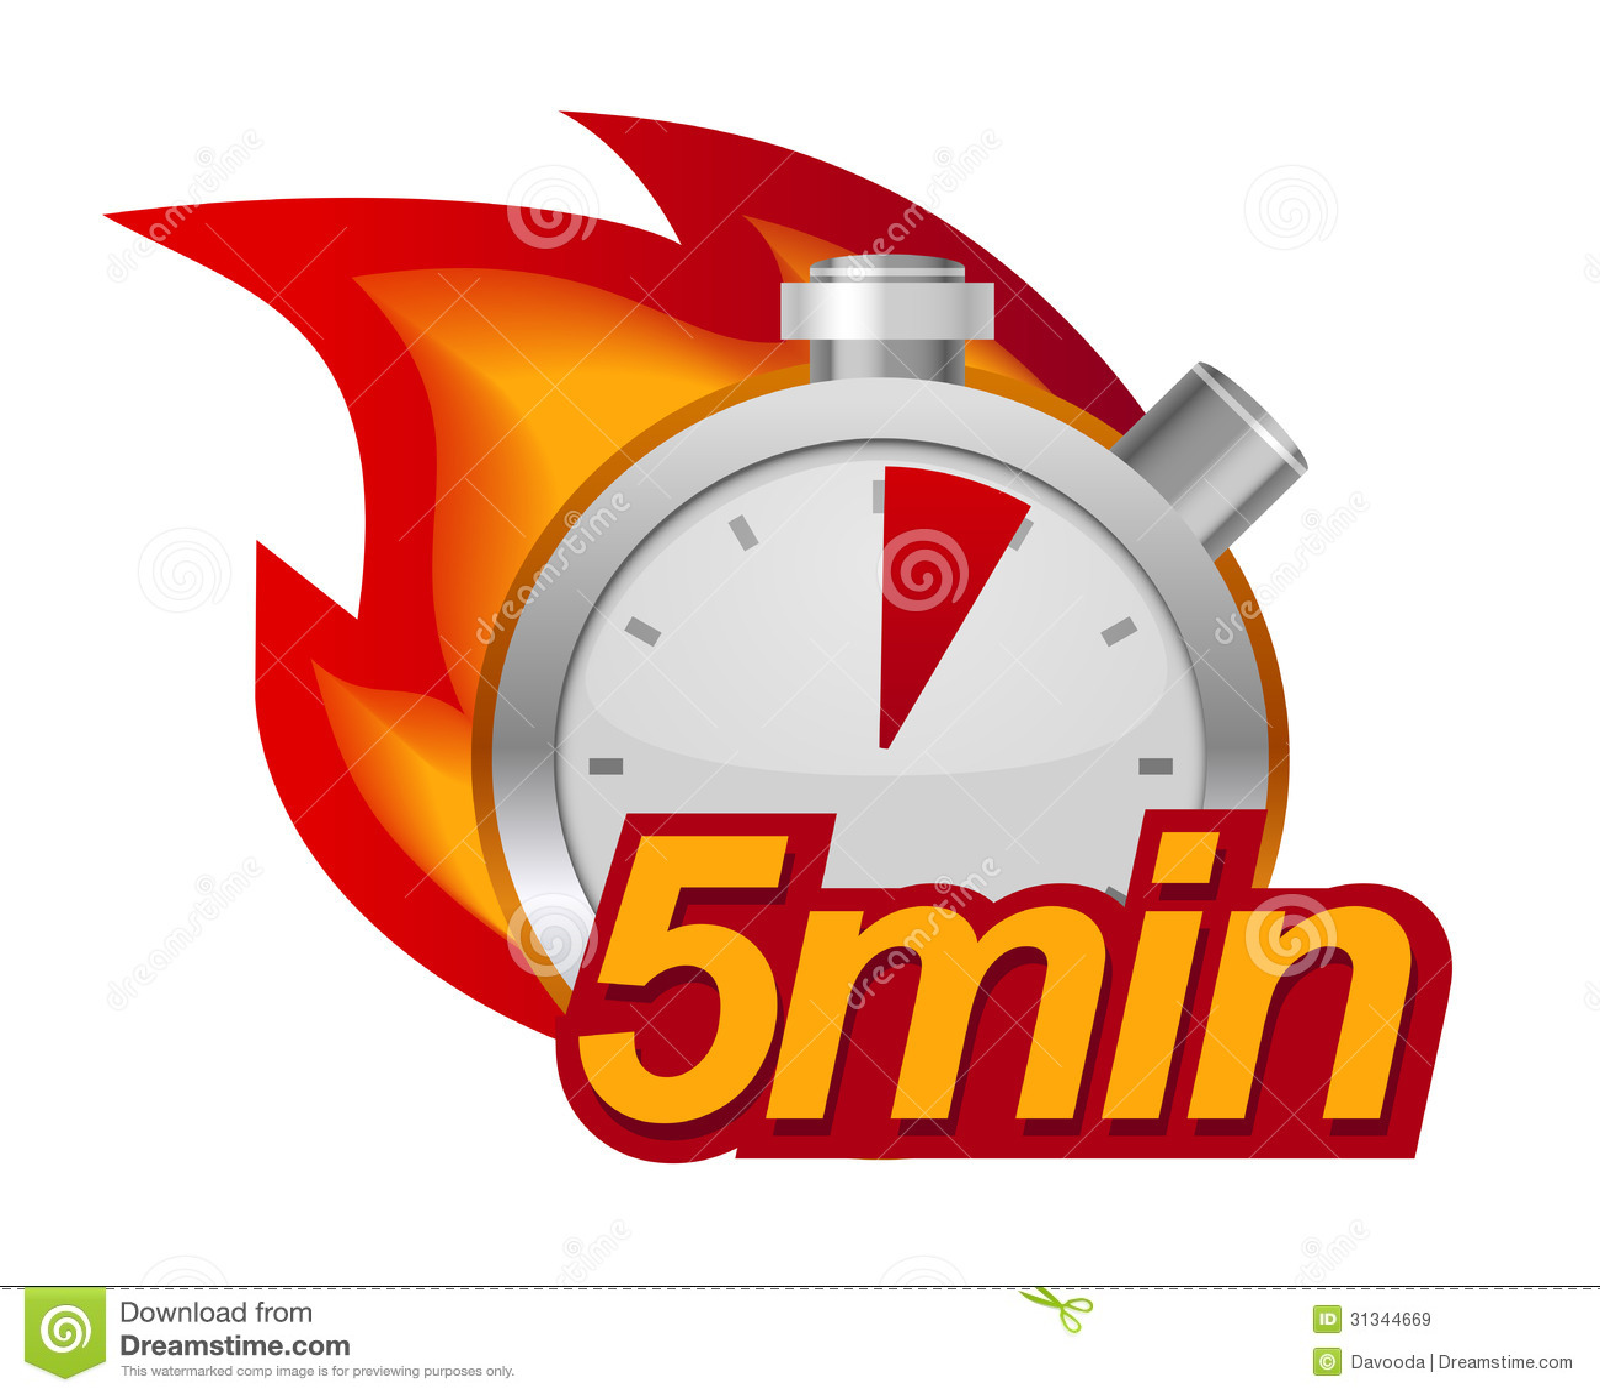 set timer for 5 min